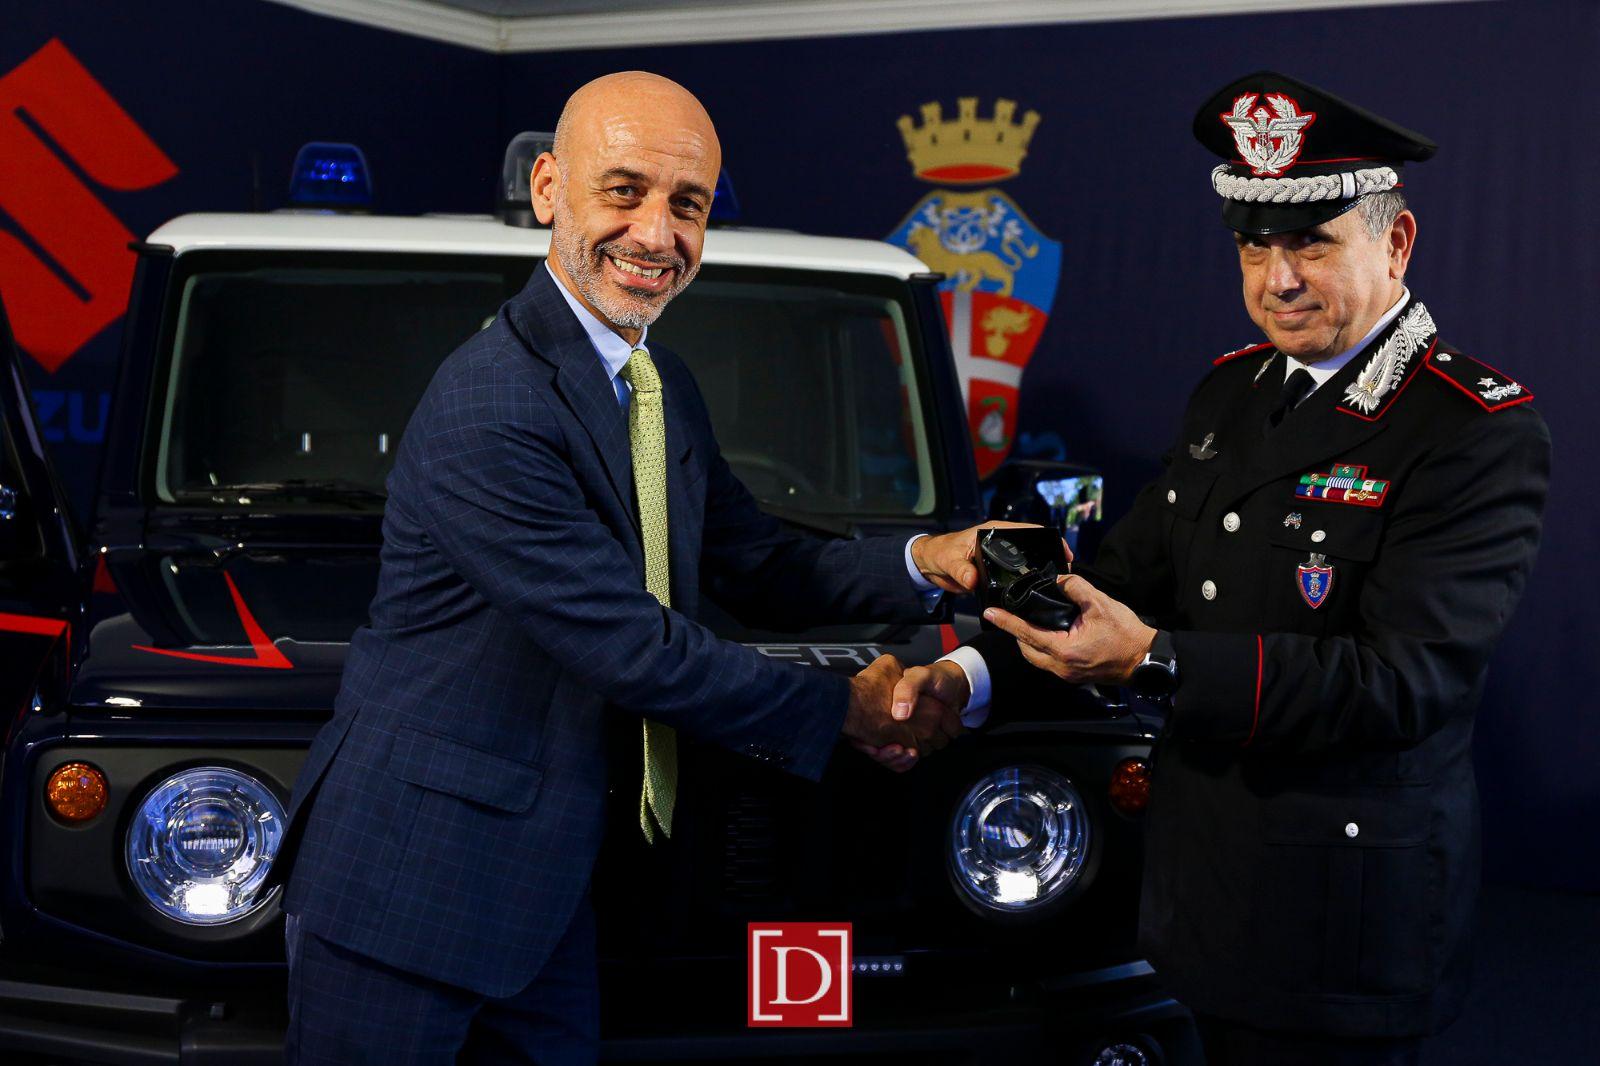 2019-10-23-suzuki-carabinieri-9018